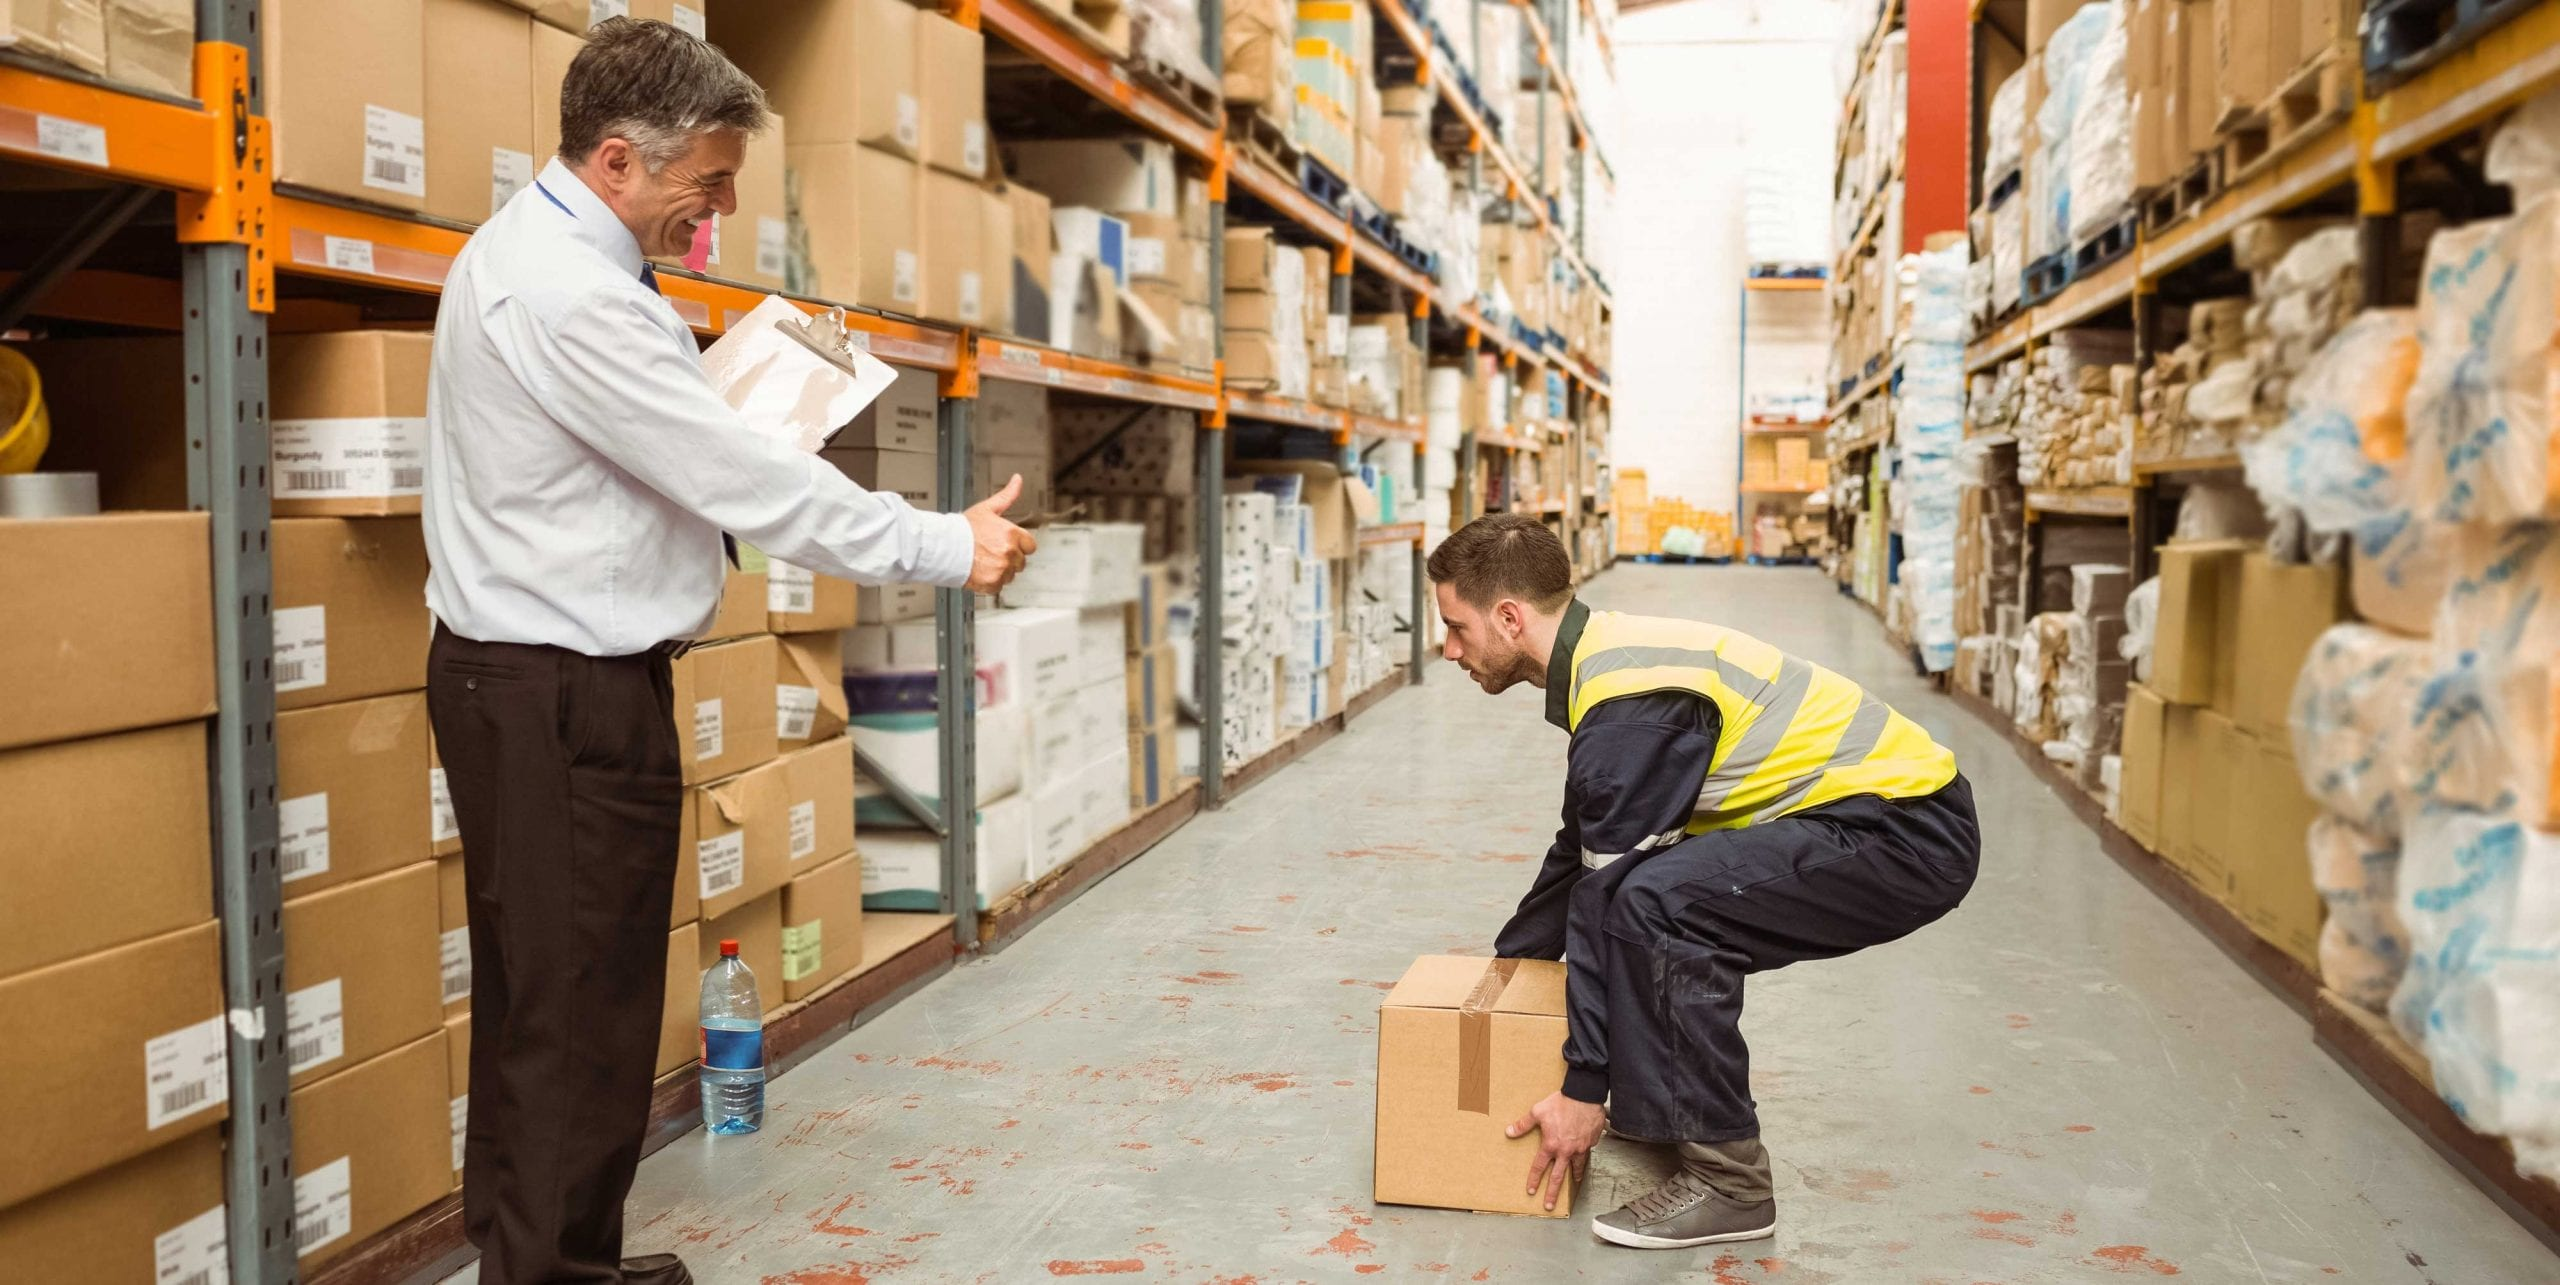 Warehouse safety lifting